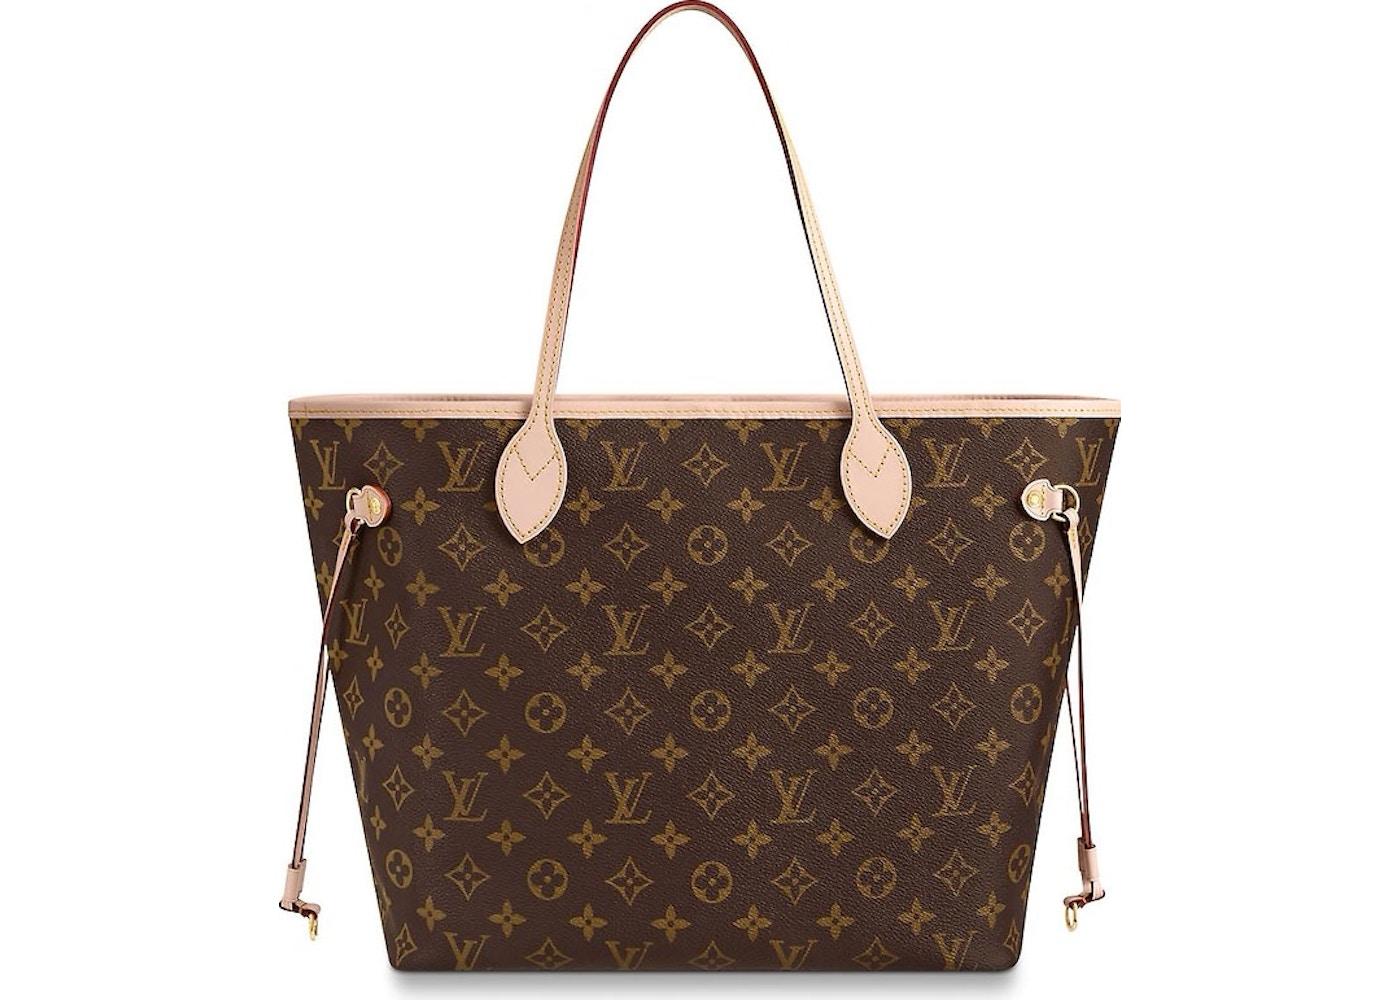 a9e6e0395b95 Louis Vuitton Neverfull Monogram MM Pivoine. Monogram MM Pivoine